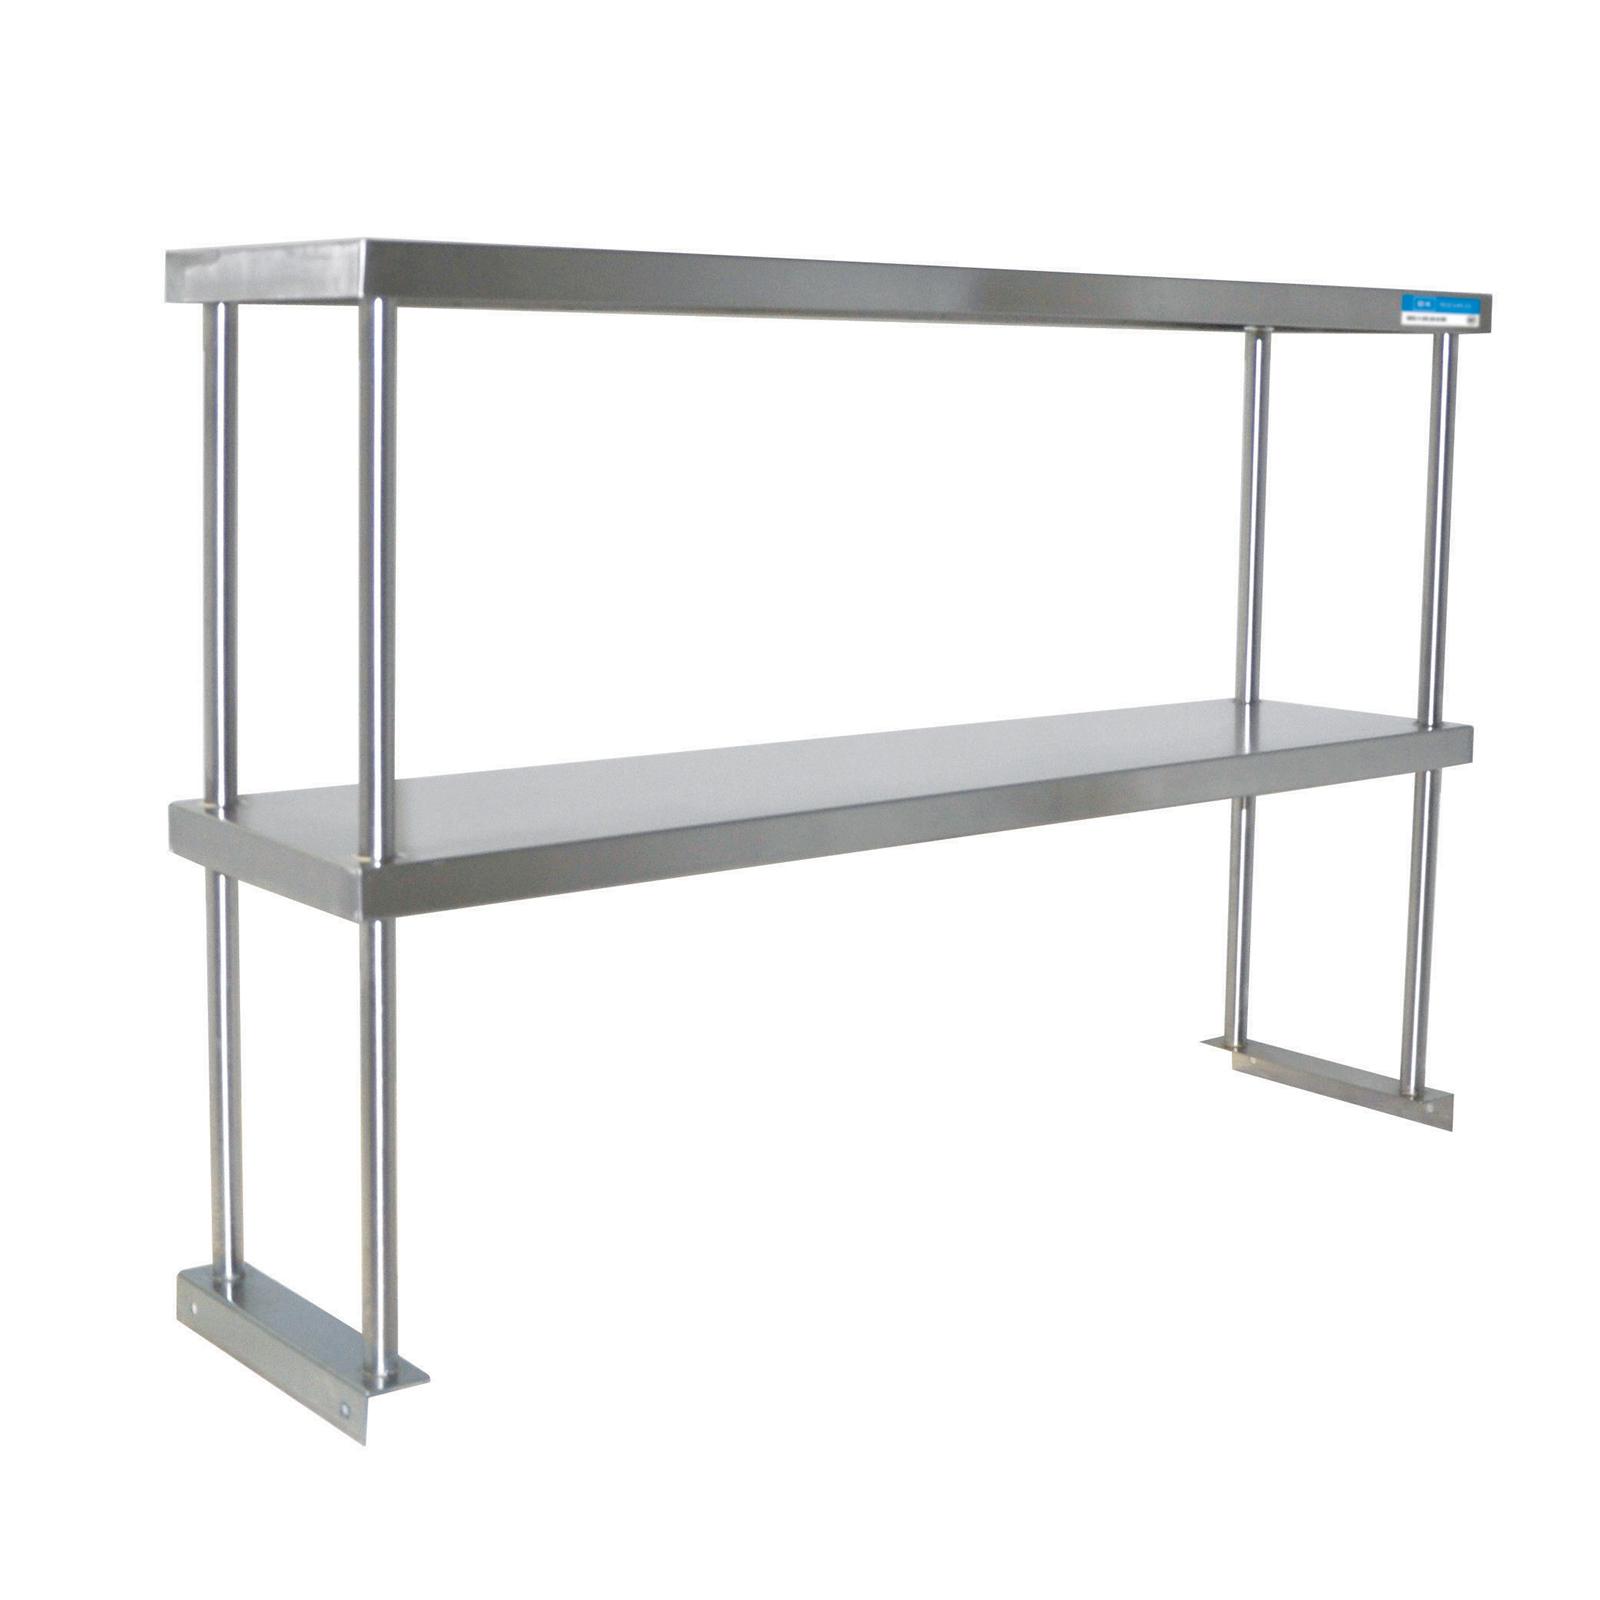 BK Resources BK-OSD-1248 overshelf, table-mounted